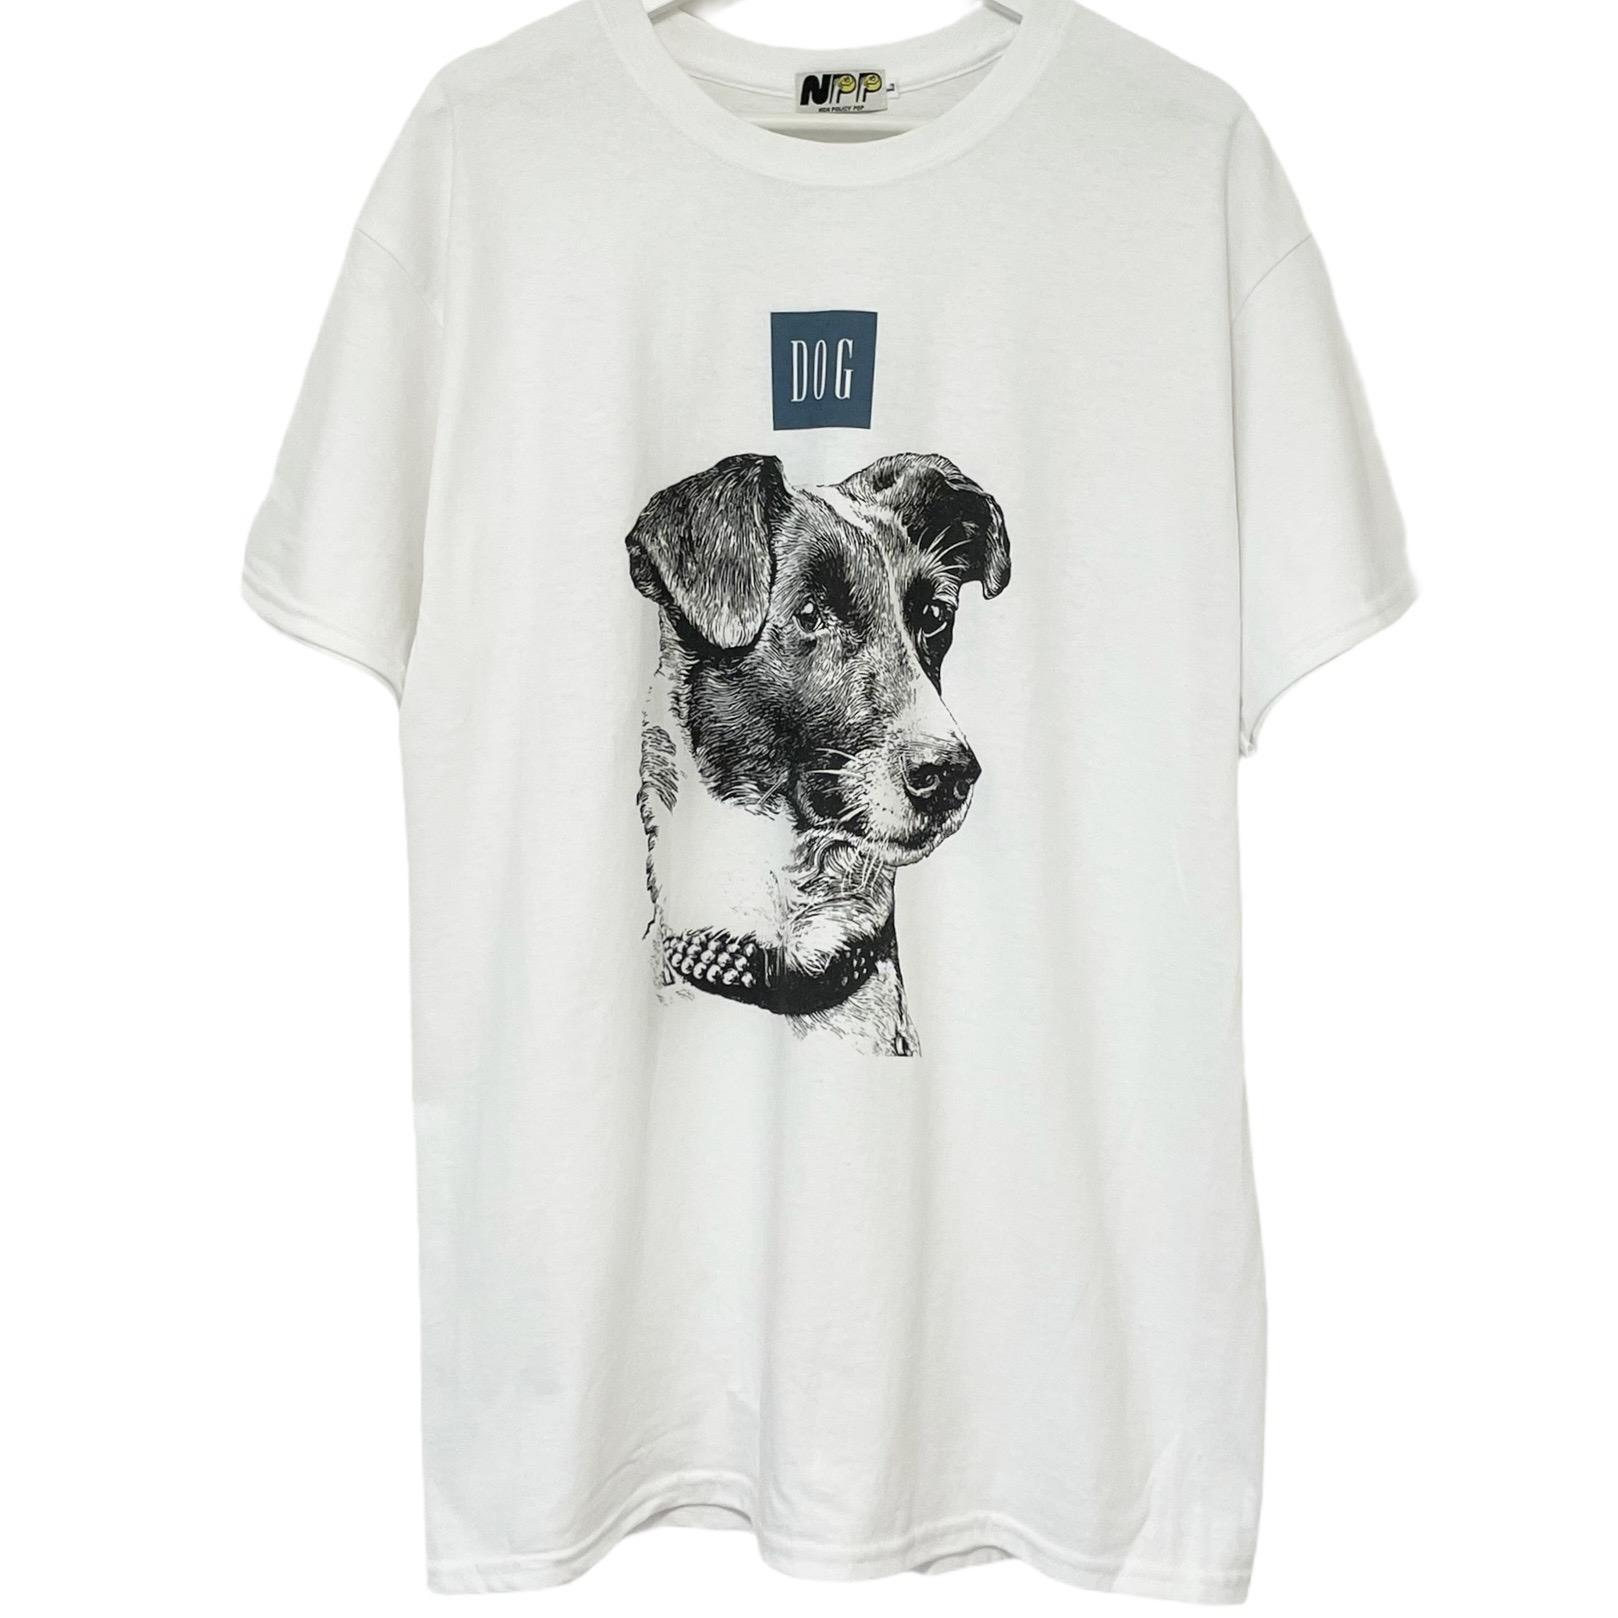 NON POLICY POP Dog T DOG 犬Tシャツ プリントTシャツ ノンポリシーポップ 半袖 大人気 ドッグ ドッグTシャツ 爆安プライス